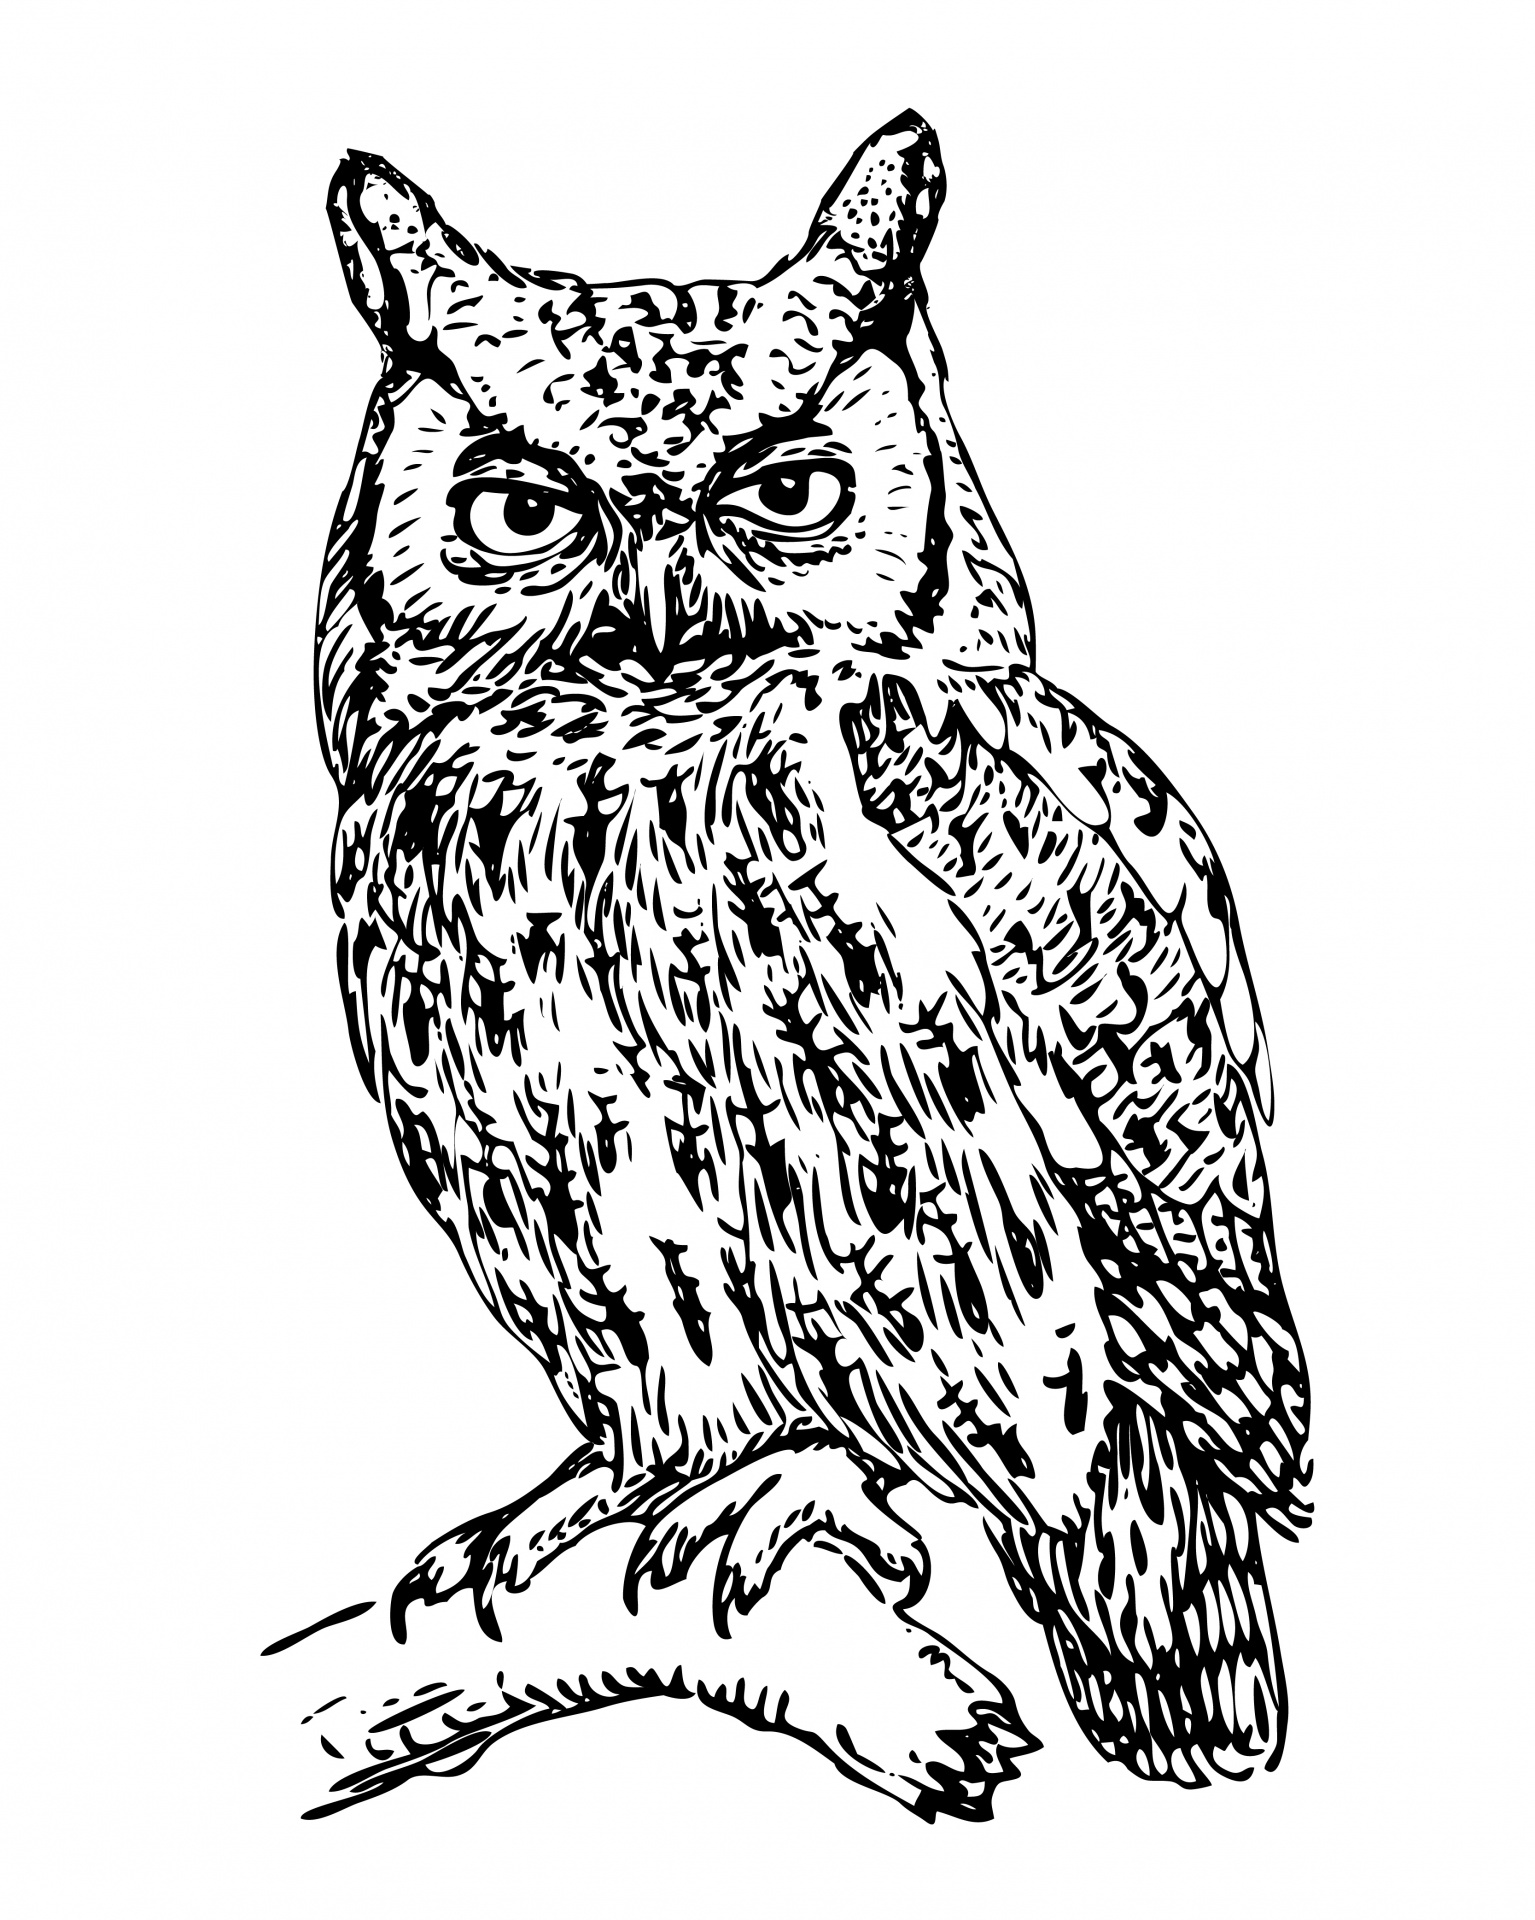 Owl illustration photo